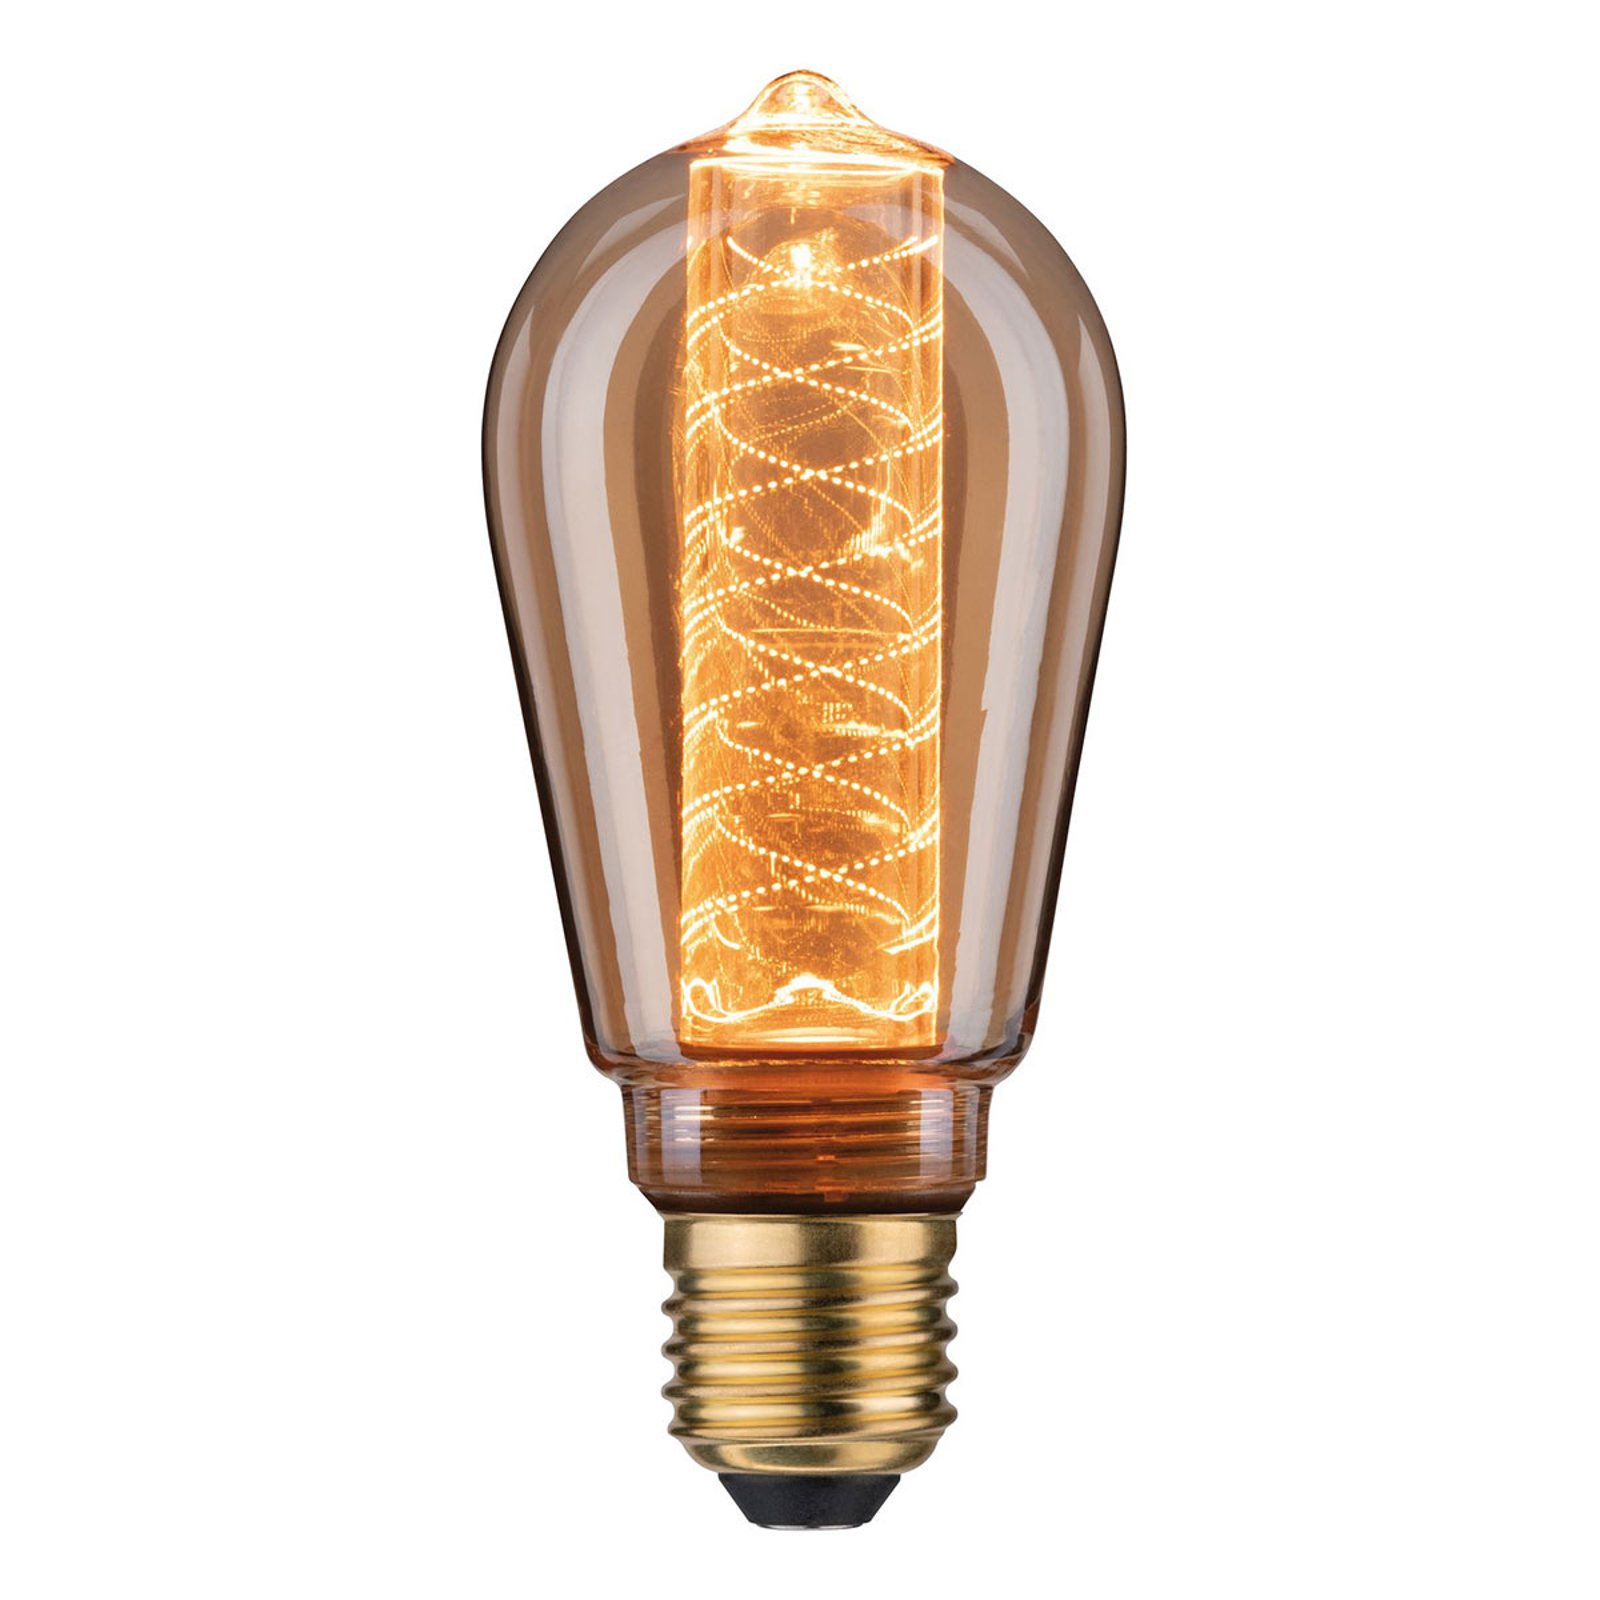 LED-Lampe E27 ST64 4W Inner Glow Spiralmuster